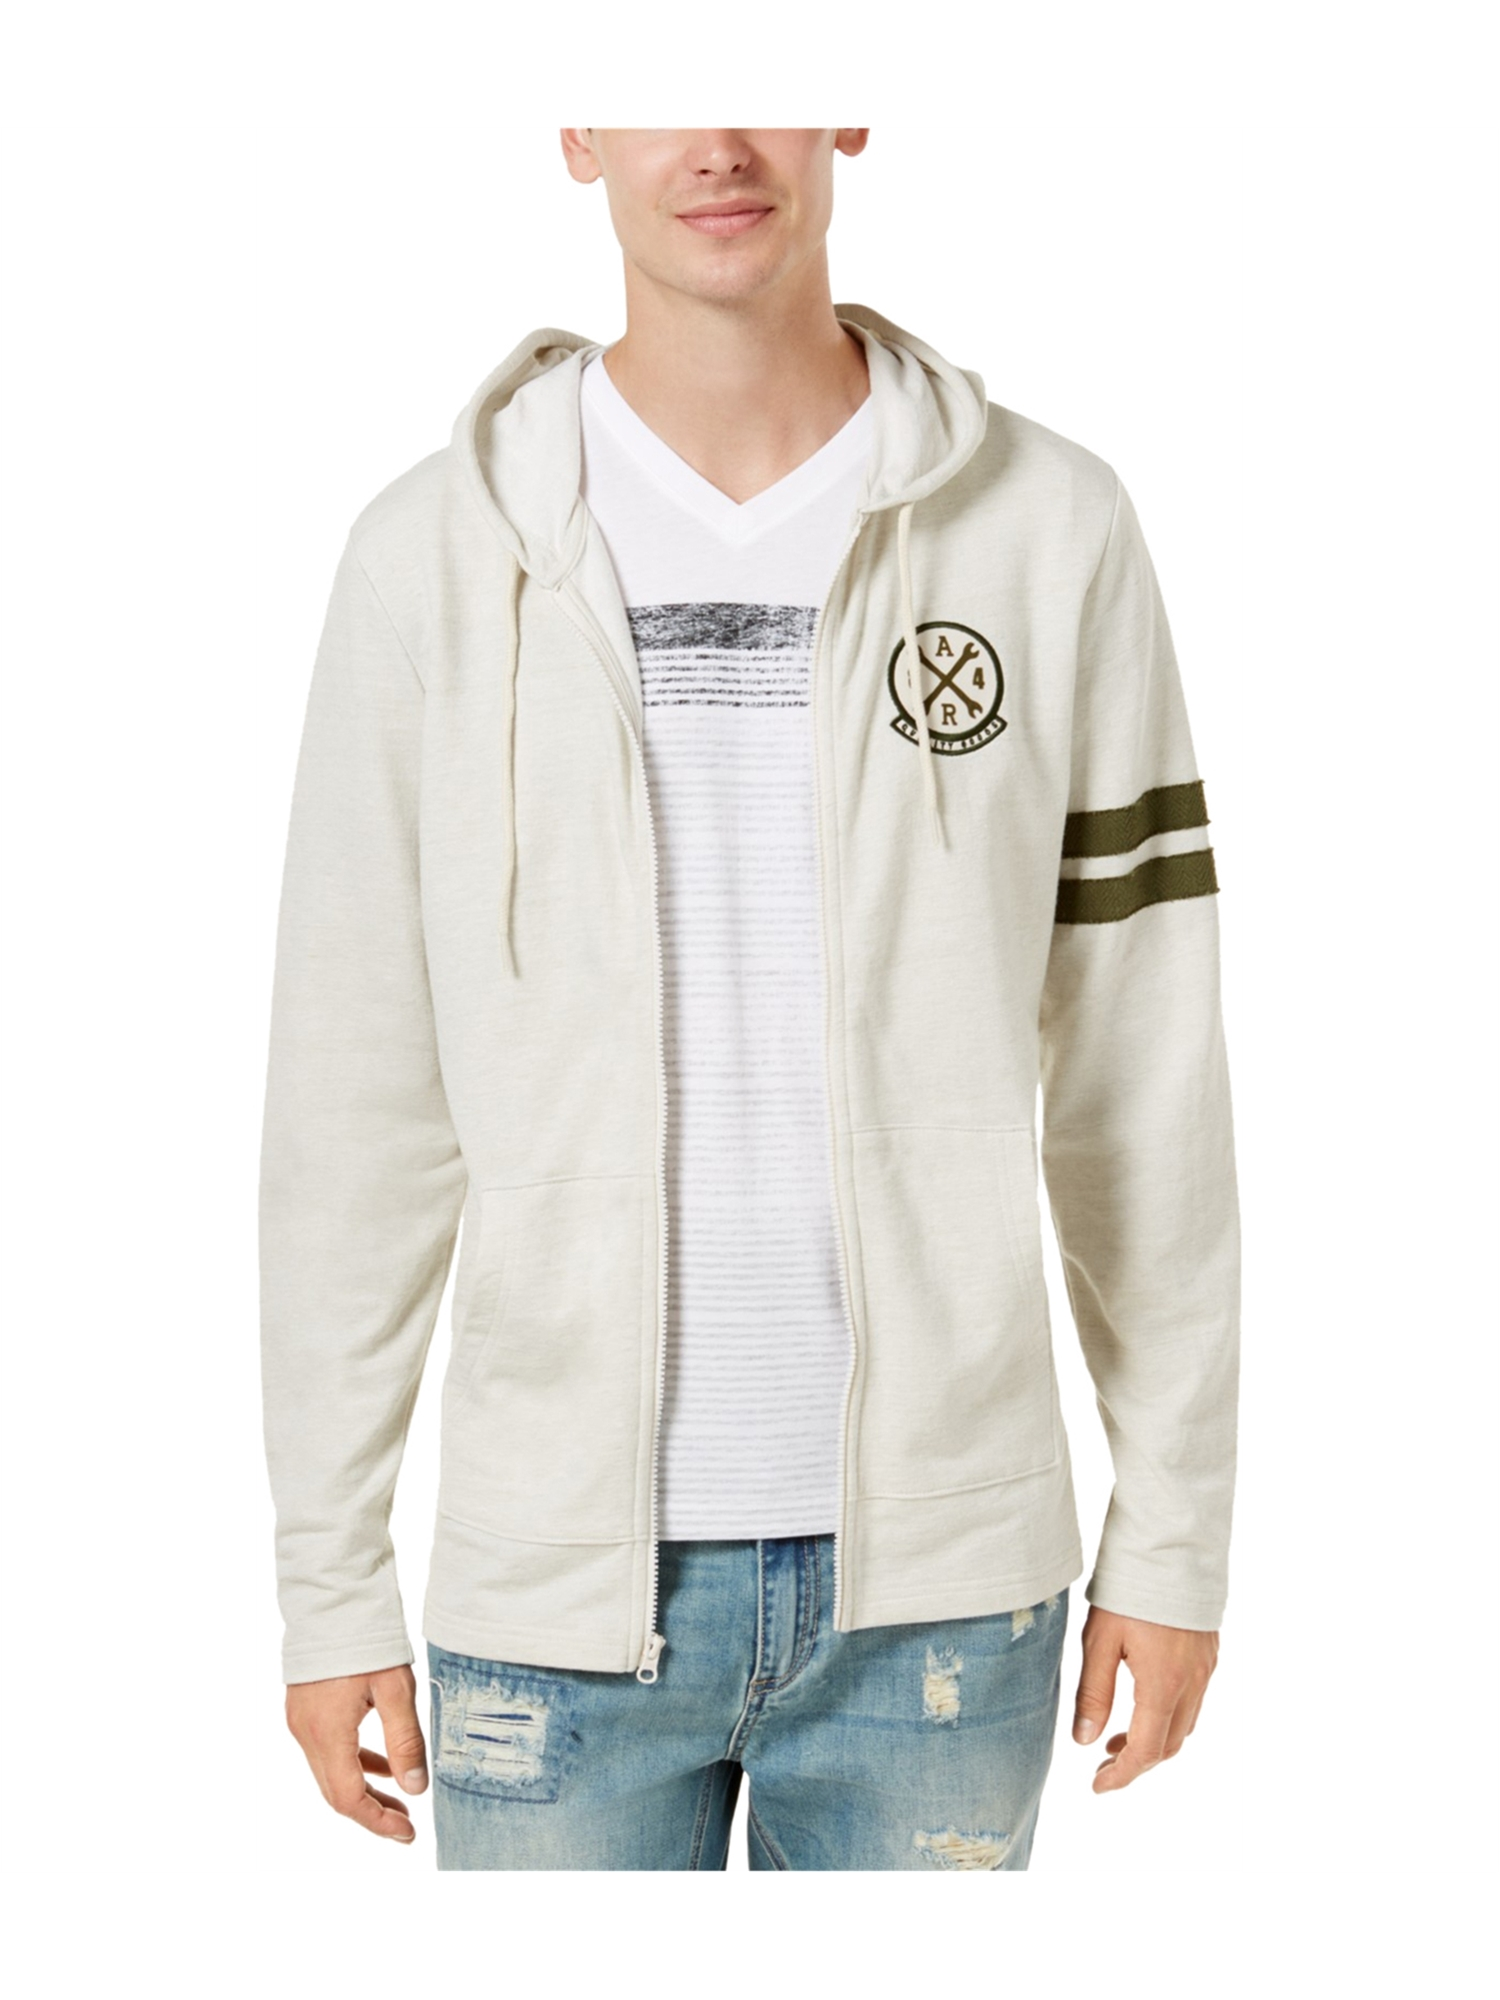 M New American Rag Men/'s Hoodie /& Sweatshirt Size S XXL L XL